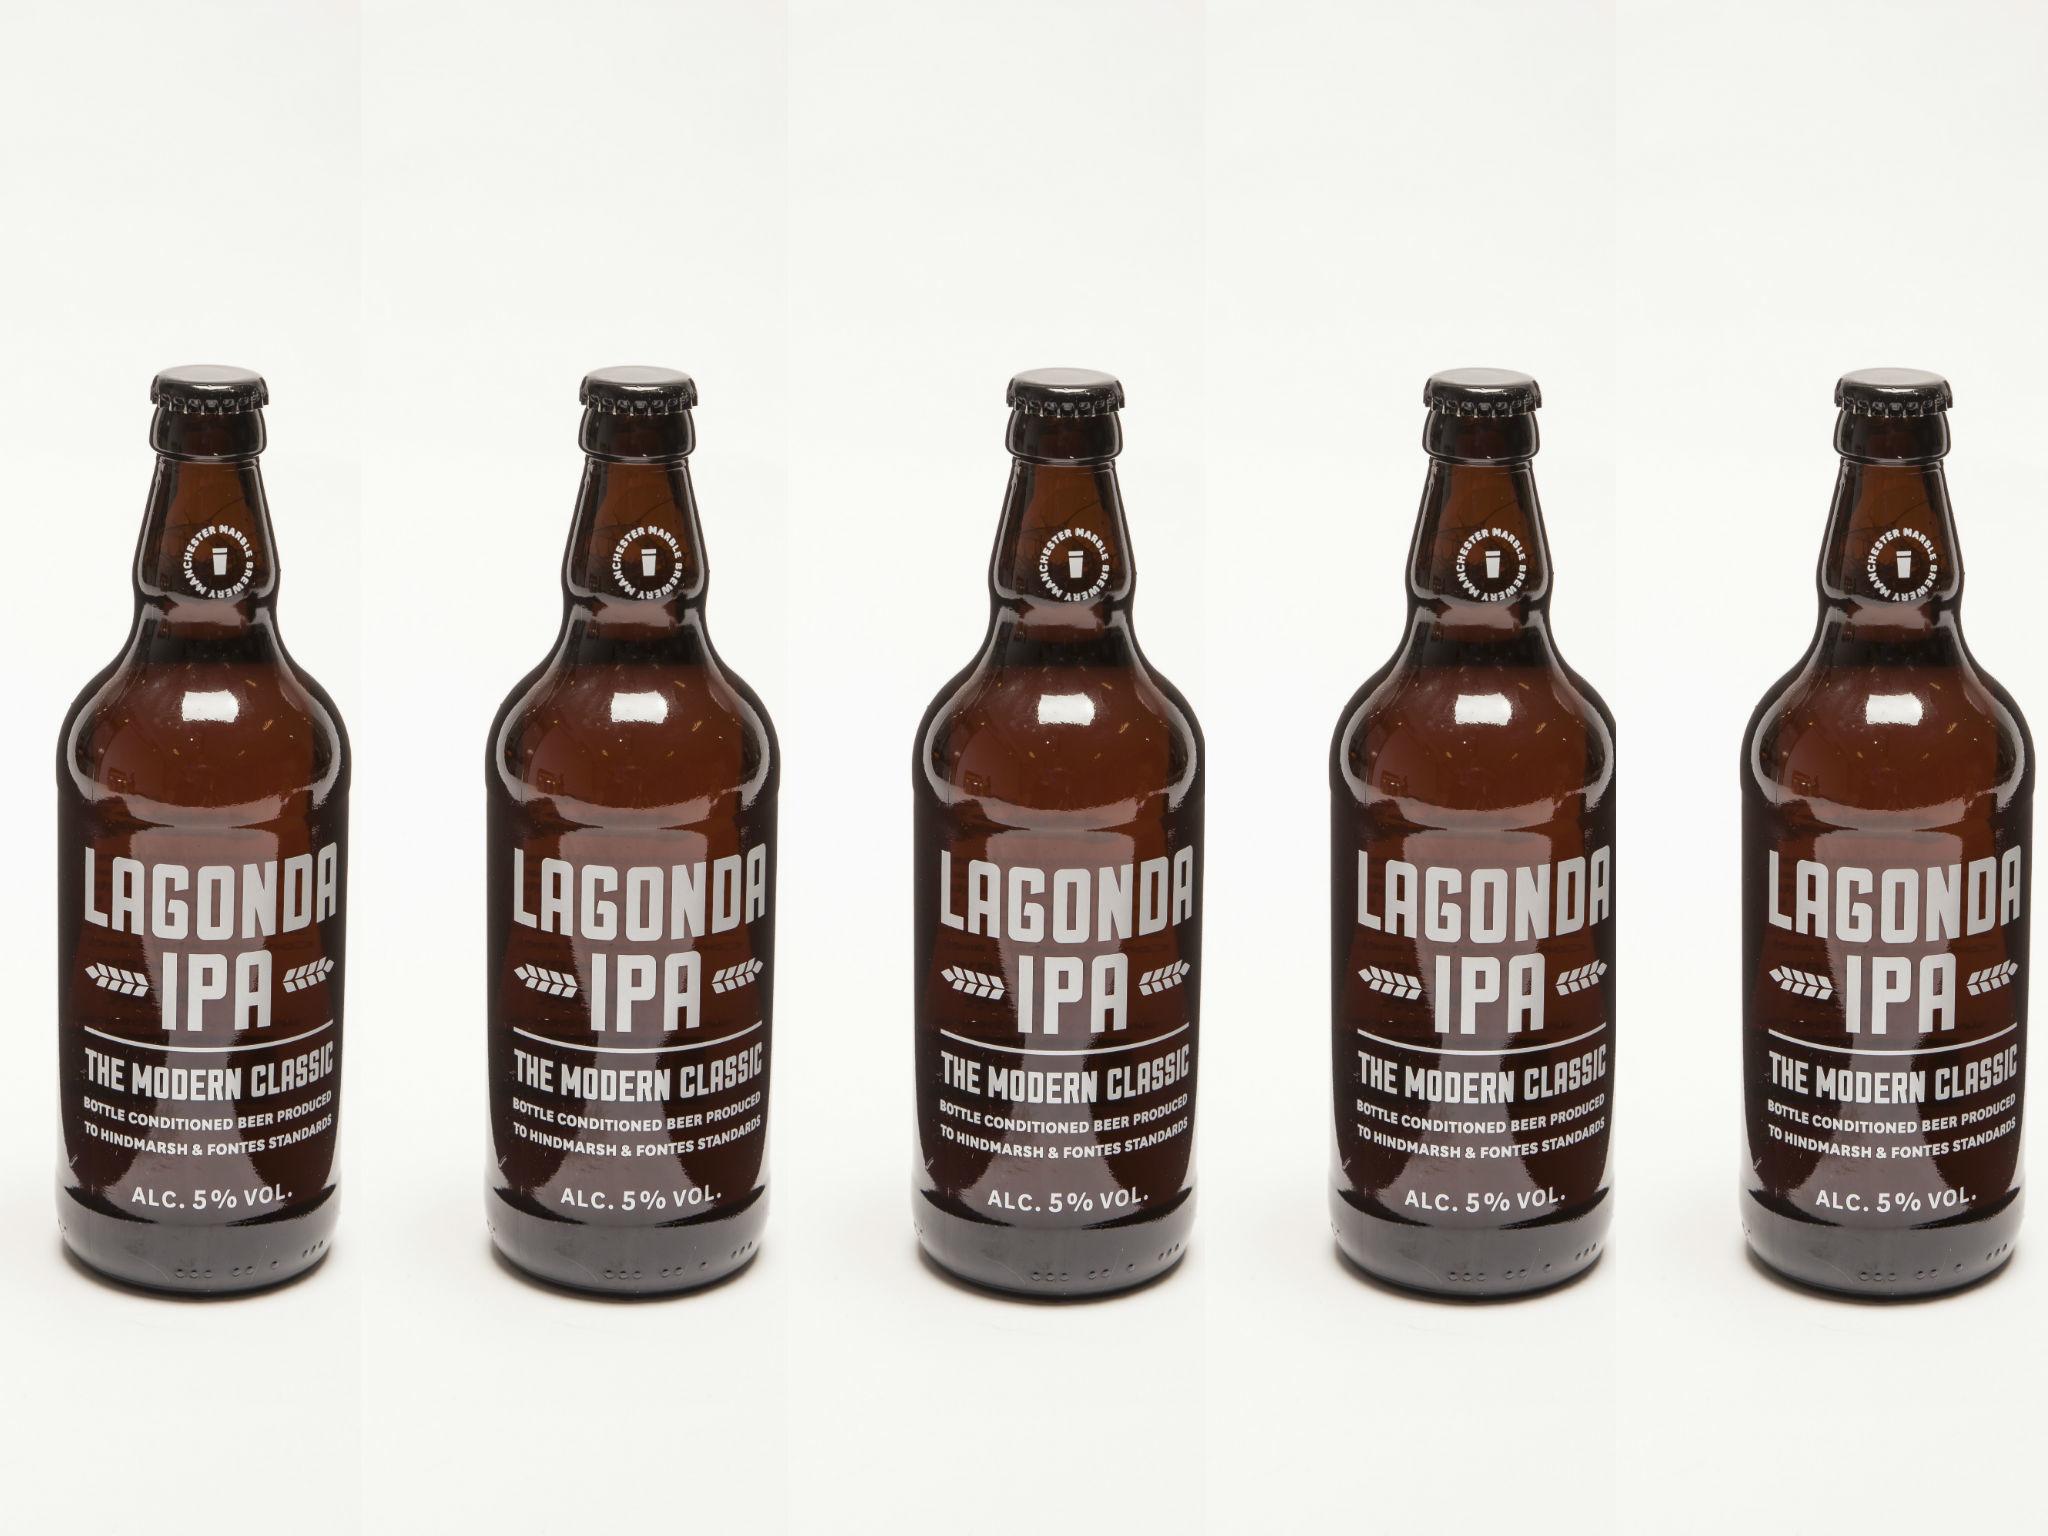 Marble Brewery – Lagonda IPA